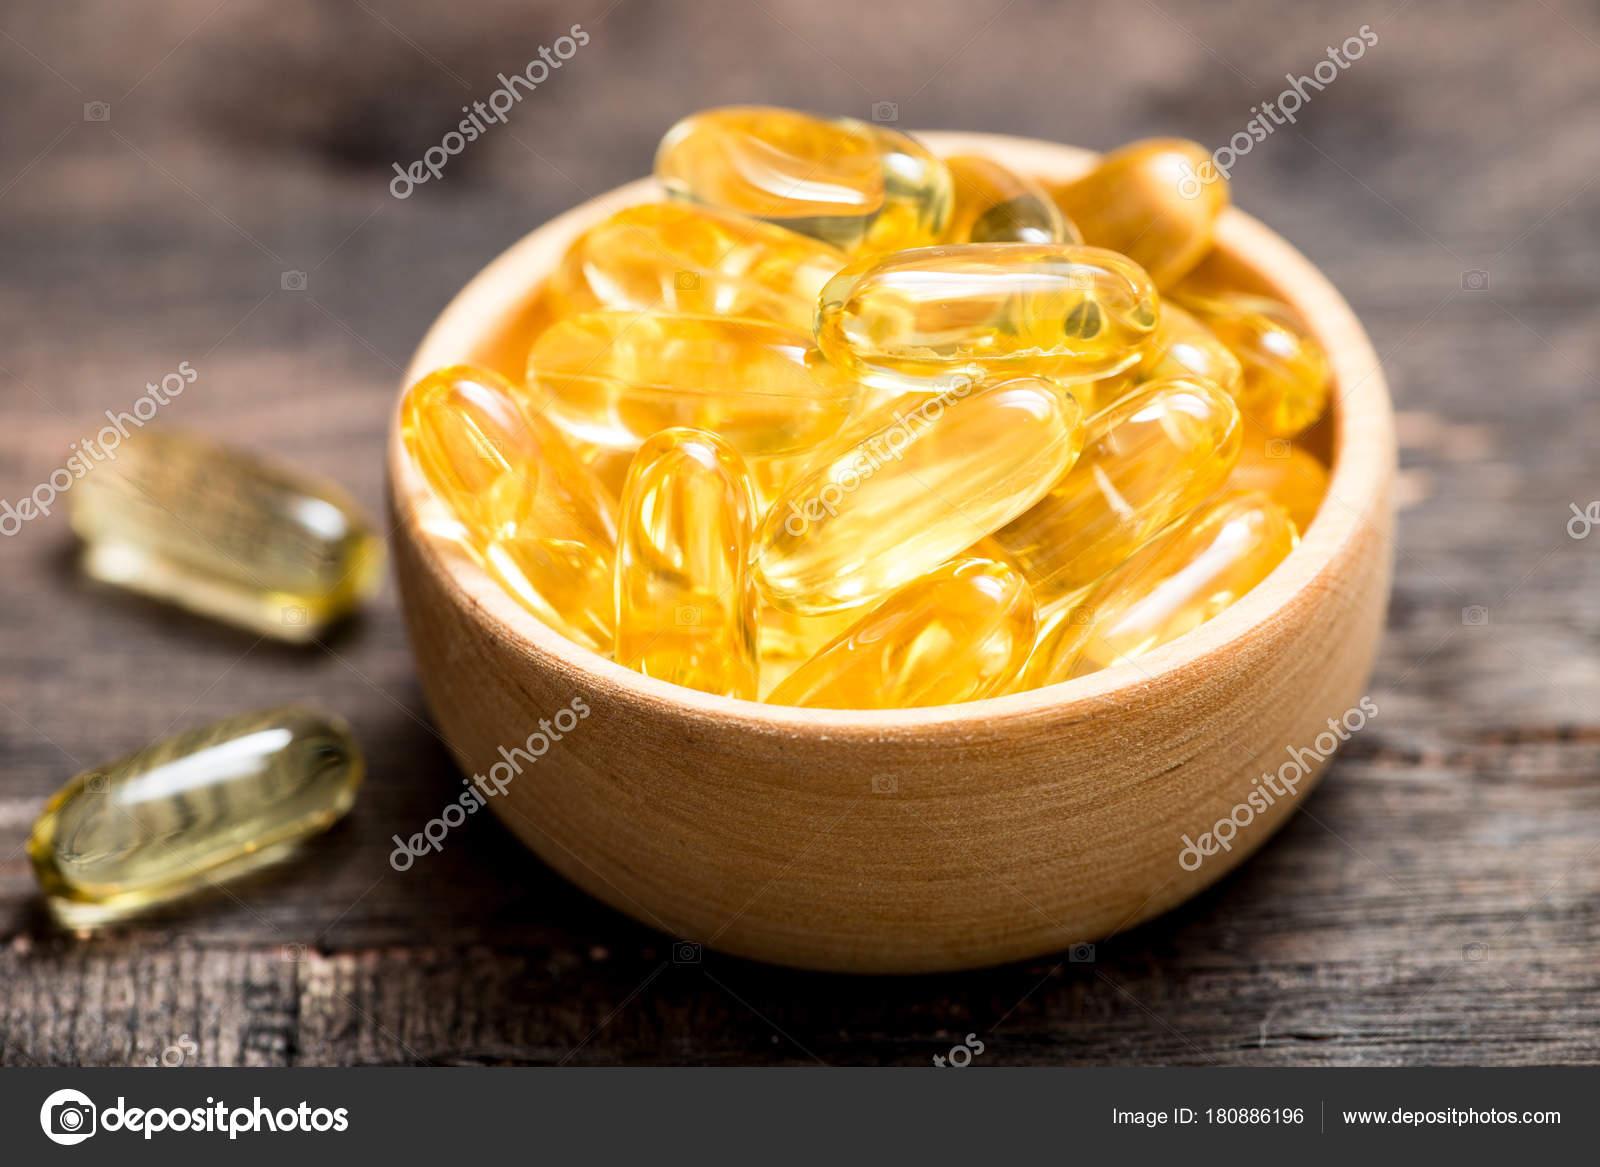 Visolie Capsules Met Omega 3 En Vitamine D Gezonde Voeding Conce Stockfoto C G Ivanna Ukr Net 180886196